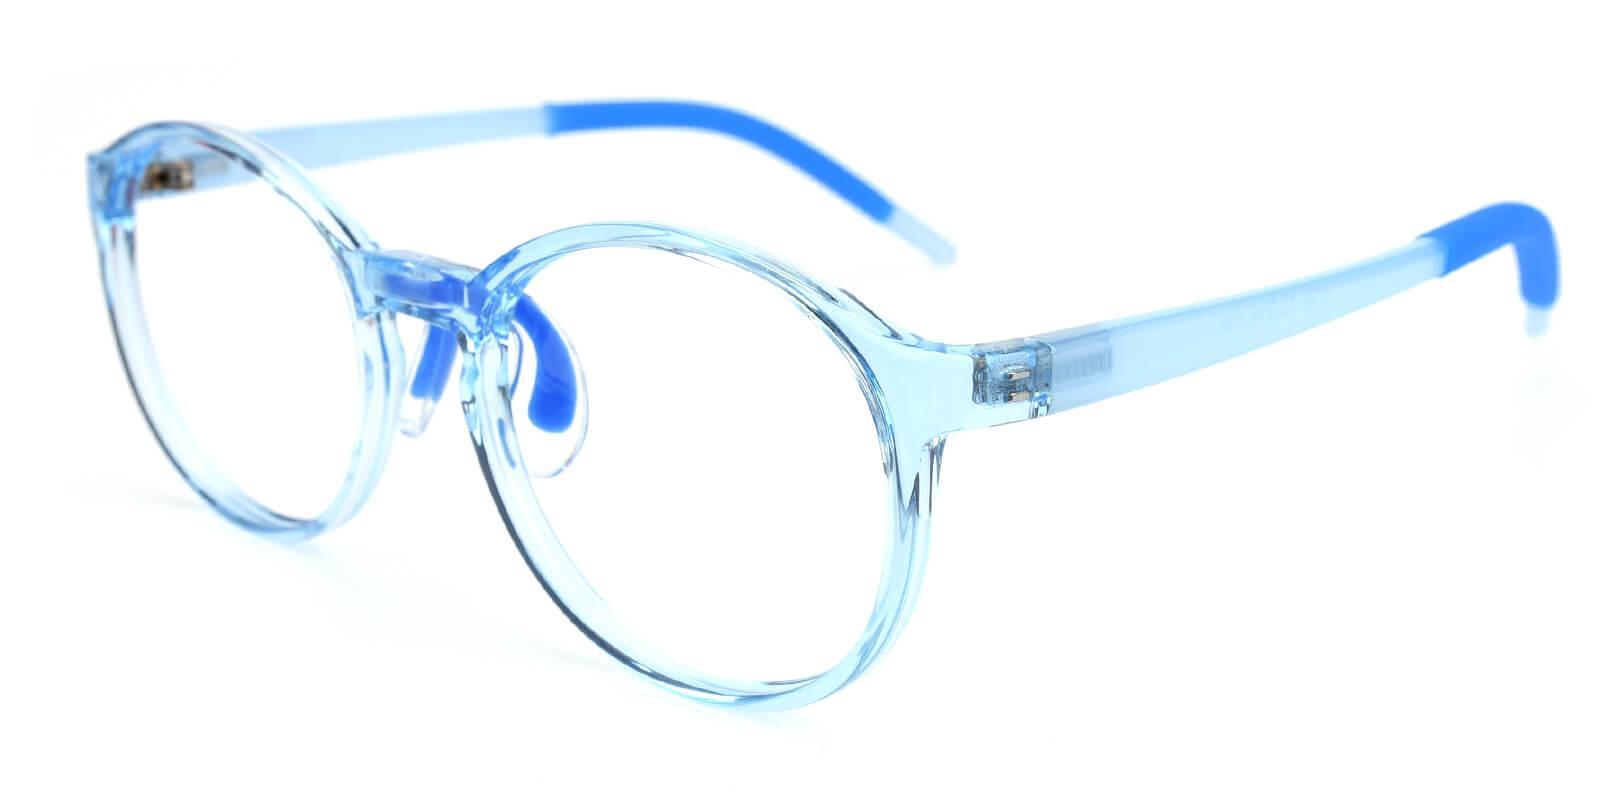 Chigor-Translucent-Round-TR-Eyeglasses-additional1